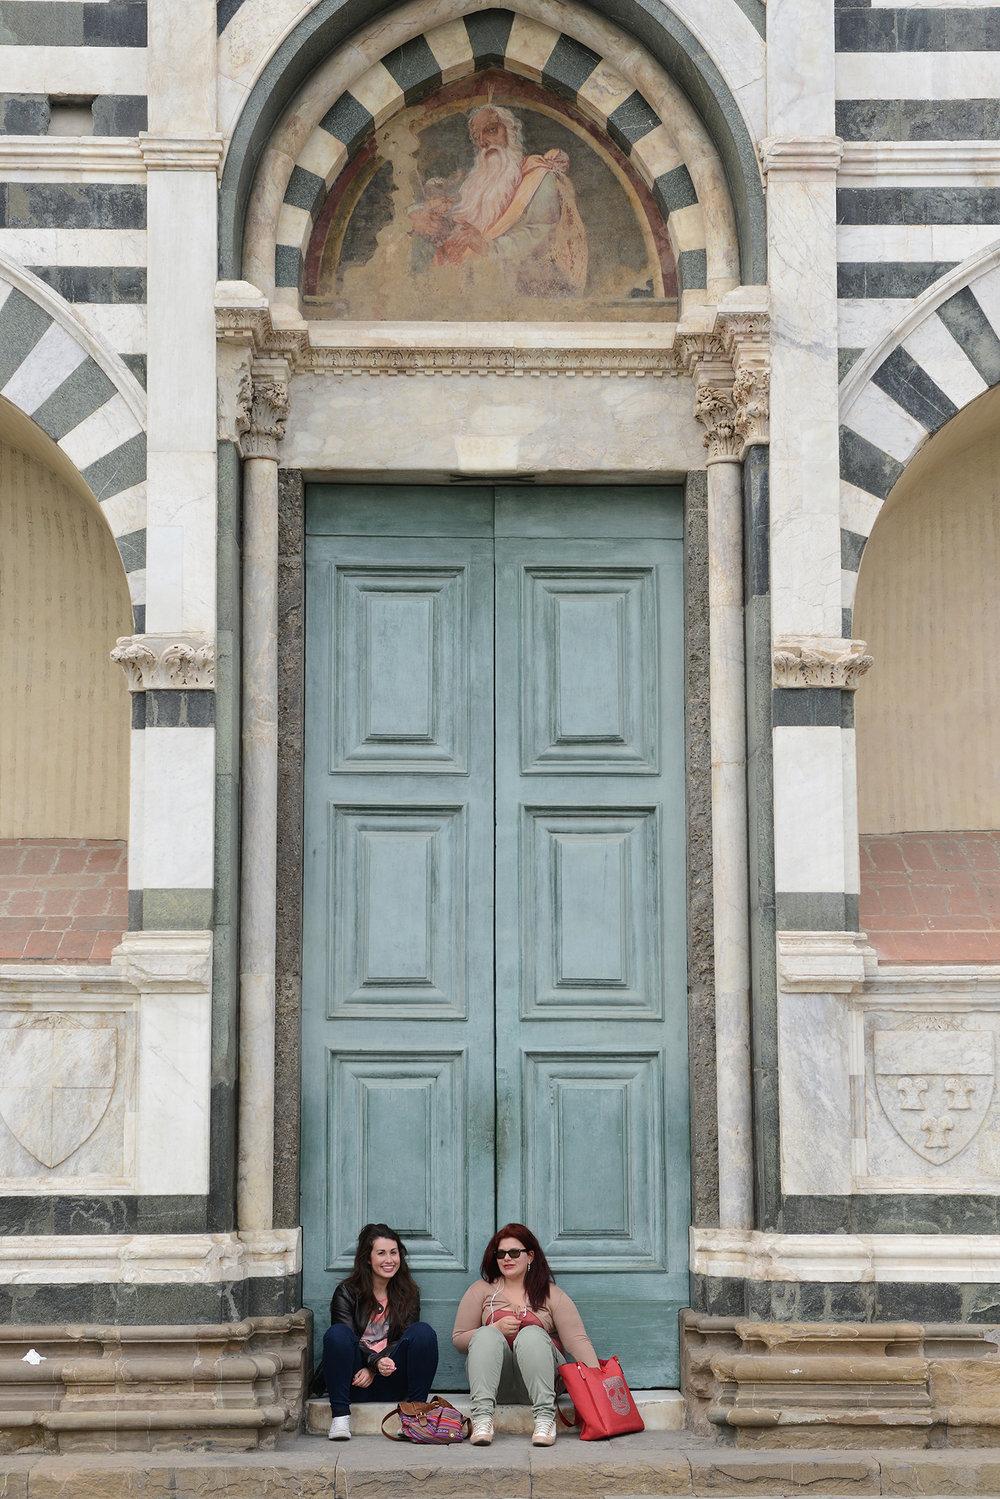 Turismi, turisti, matka, matkablogi, matka, Italia, Firenze, kirkko